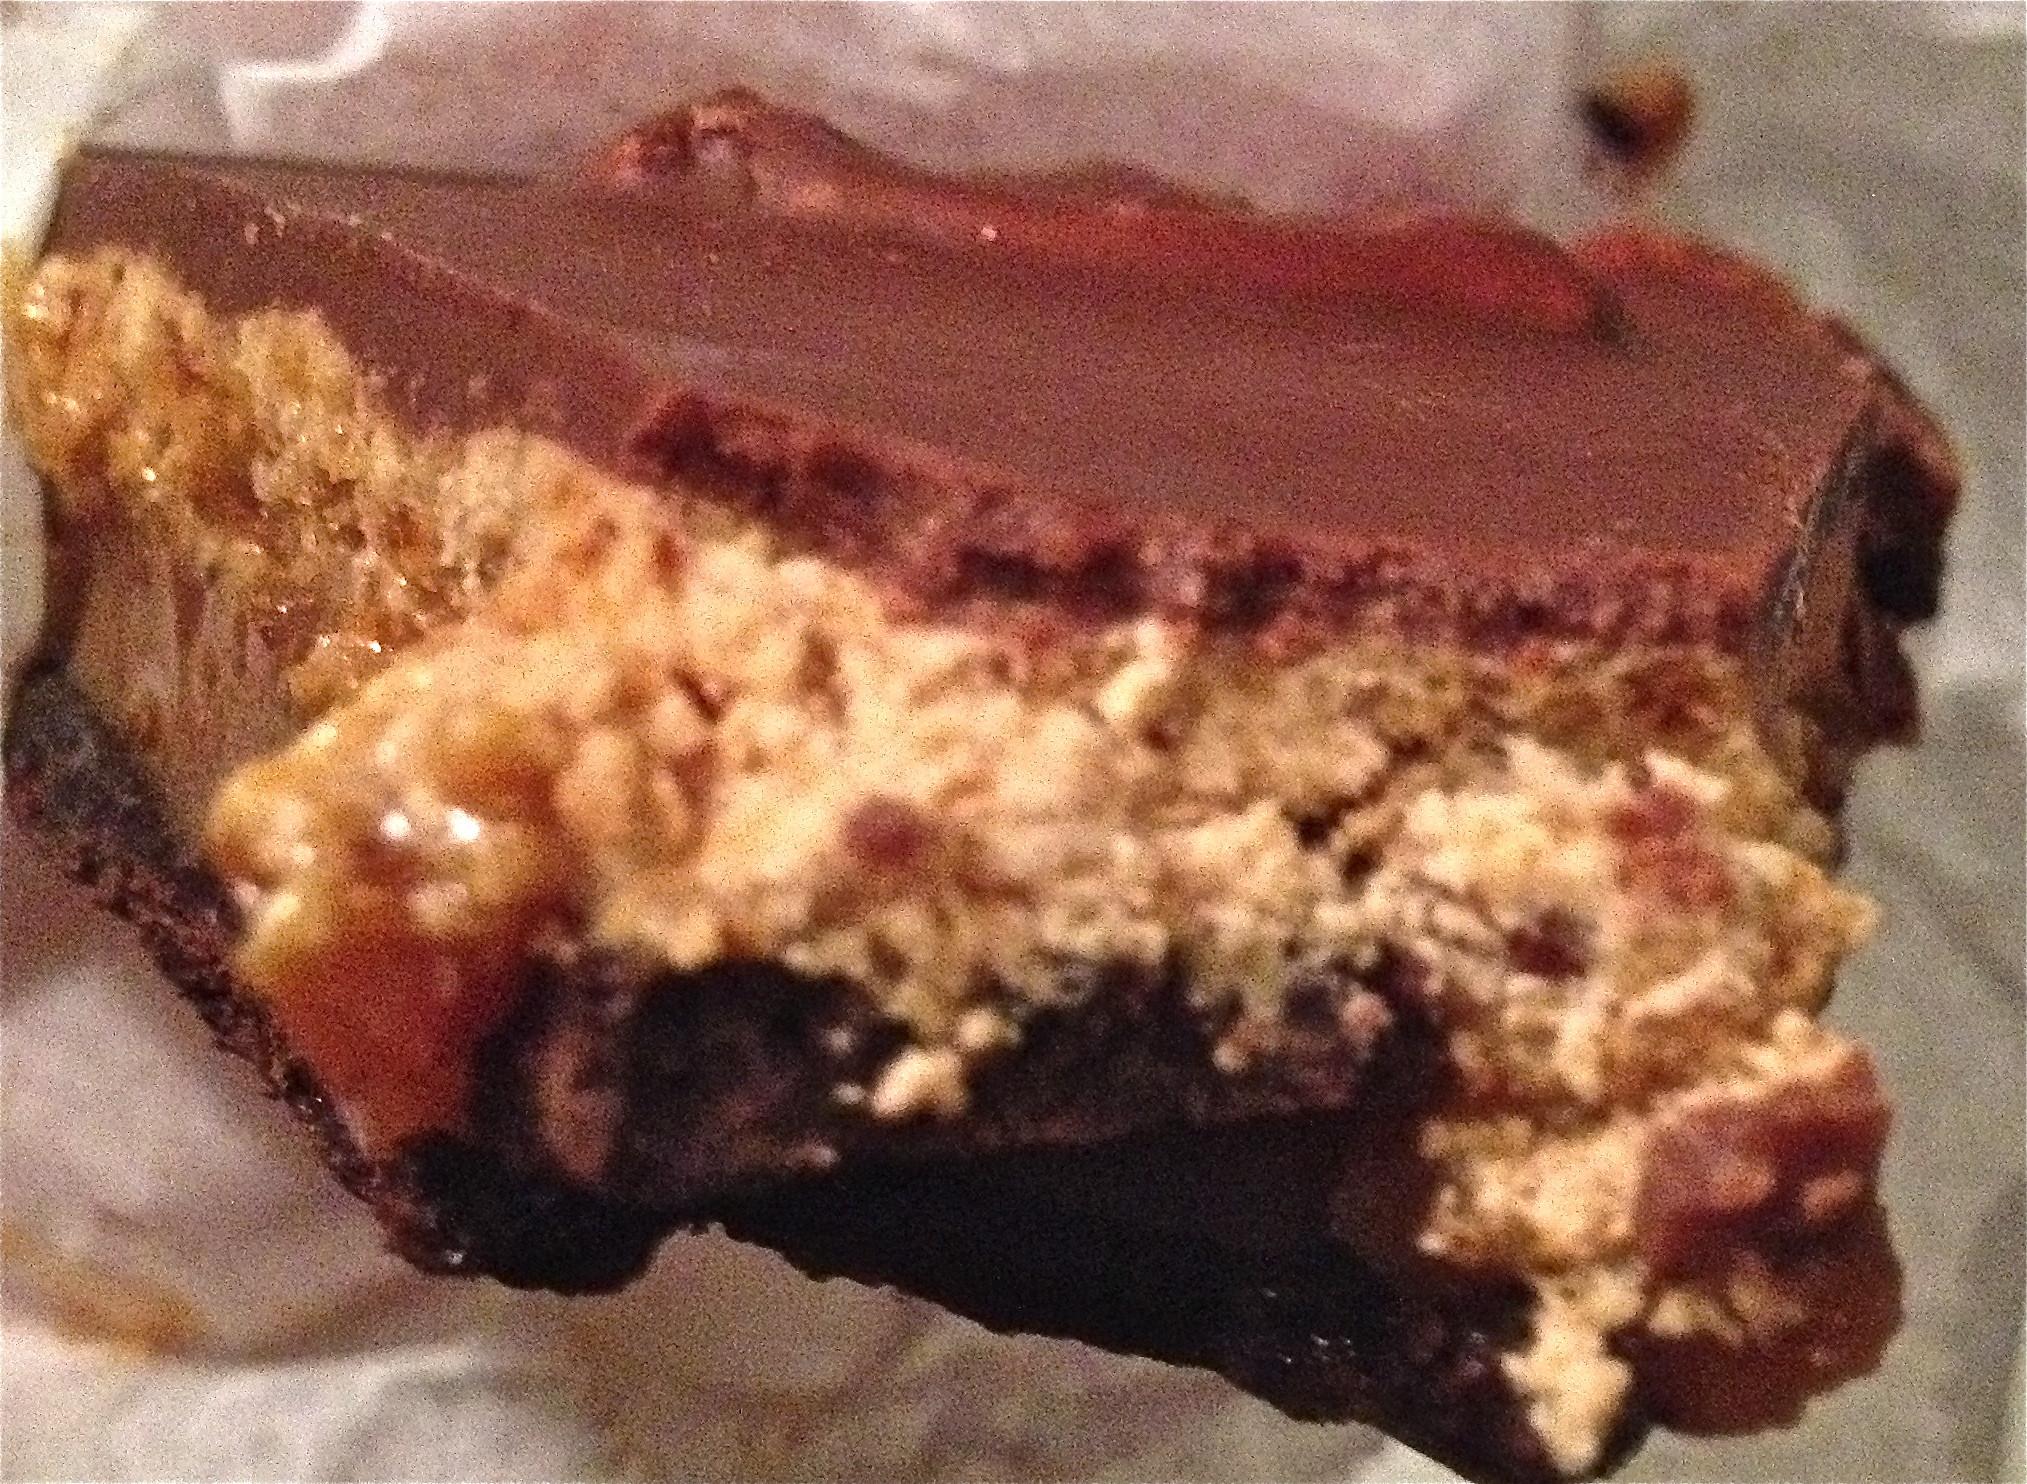 Best Peanut Butter Dessert  Best Peanut Butter Desserts in New York City